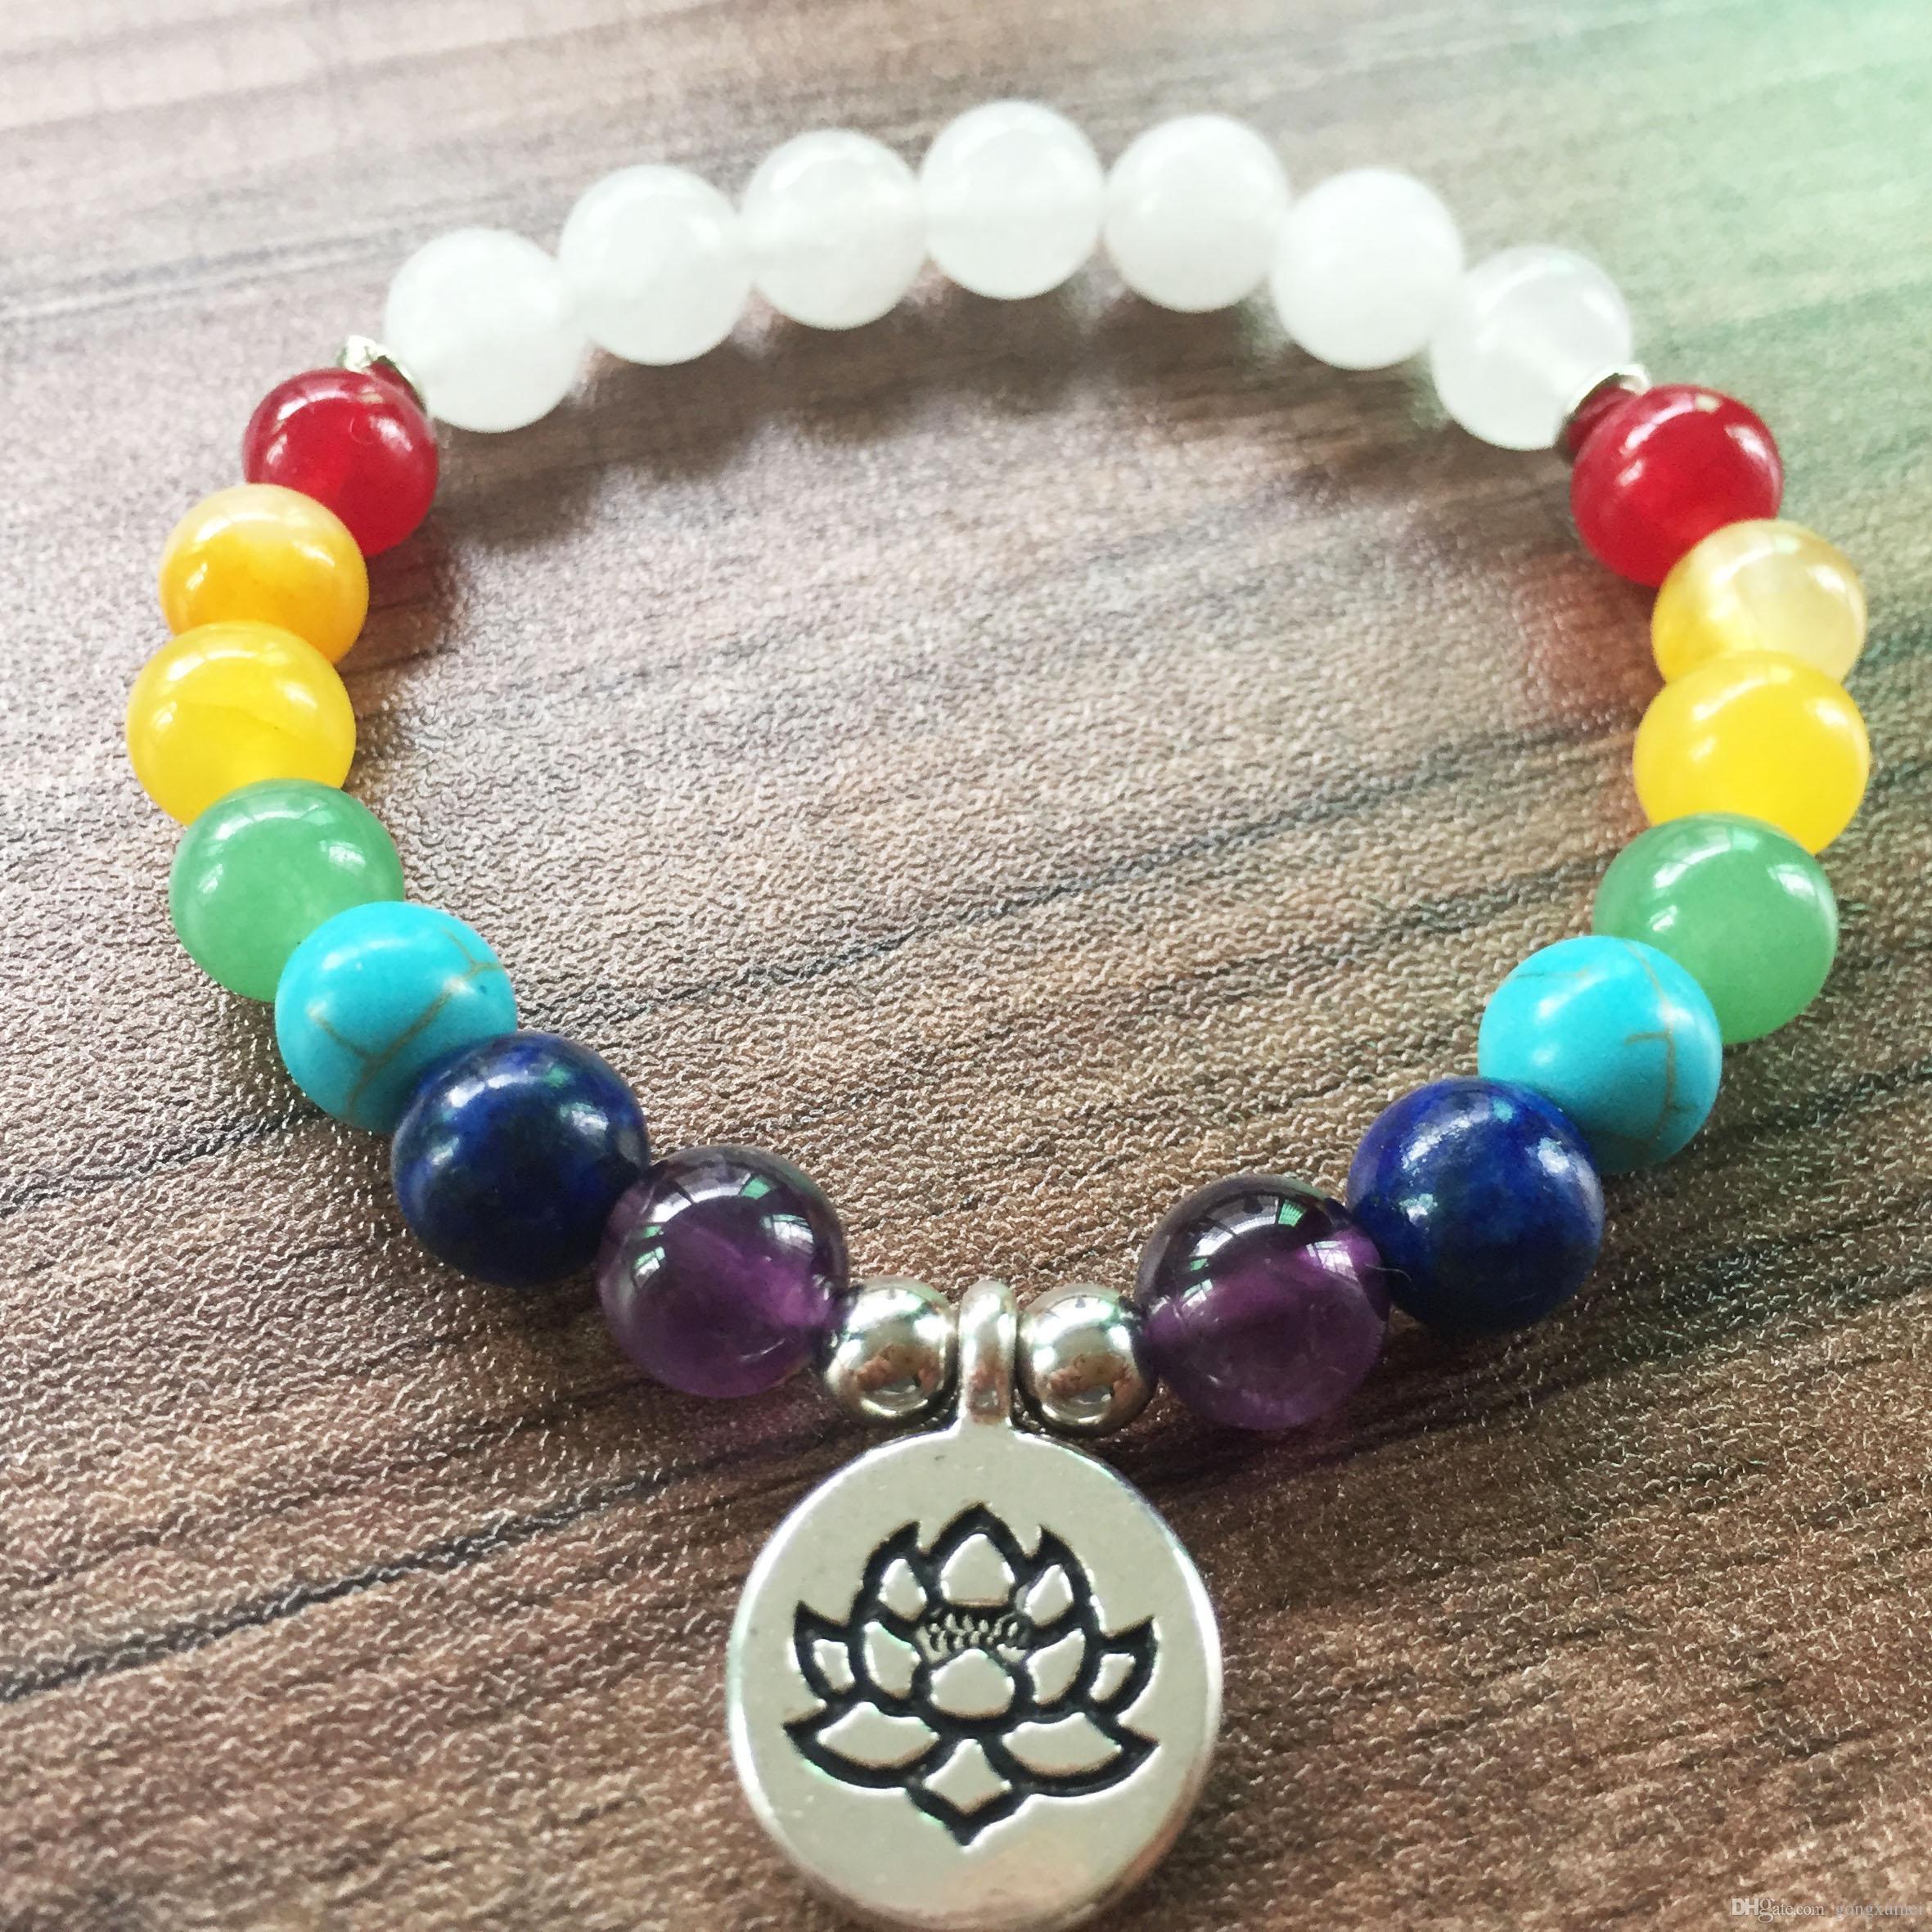 8mm Lava Stone White Jade OM Pendant Mala Bracelet Chakra Meditation